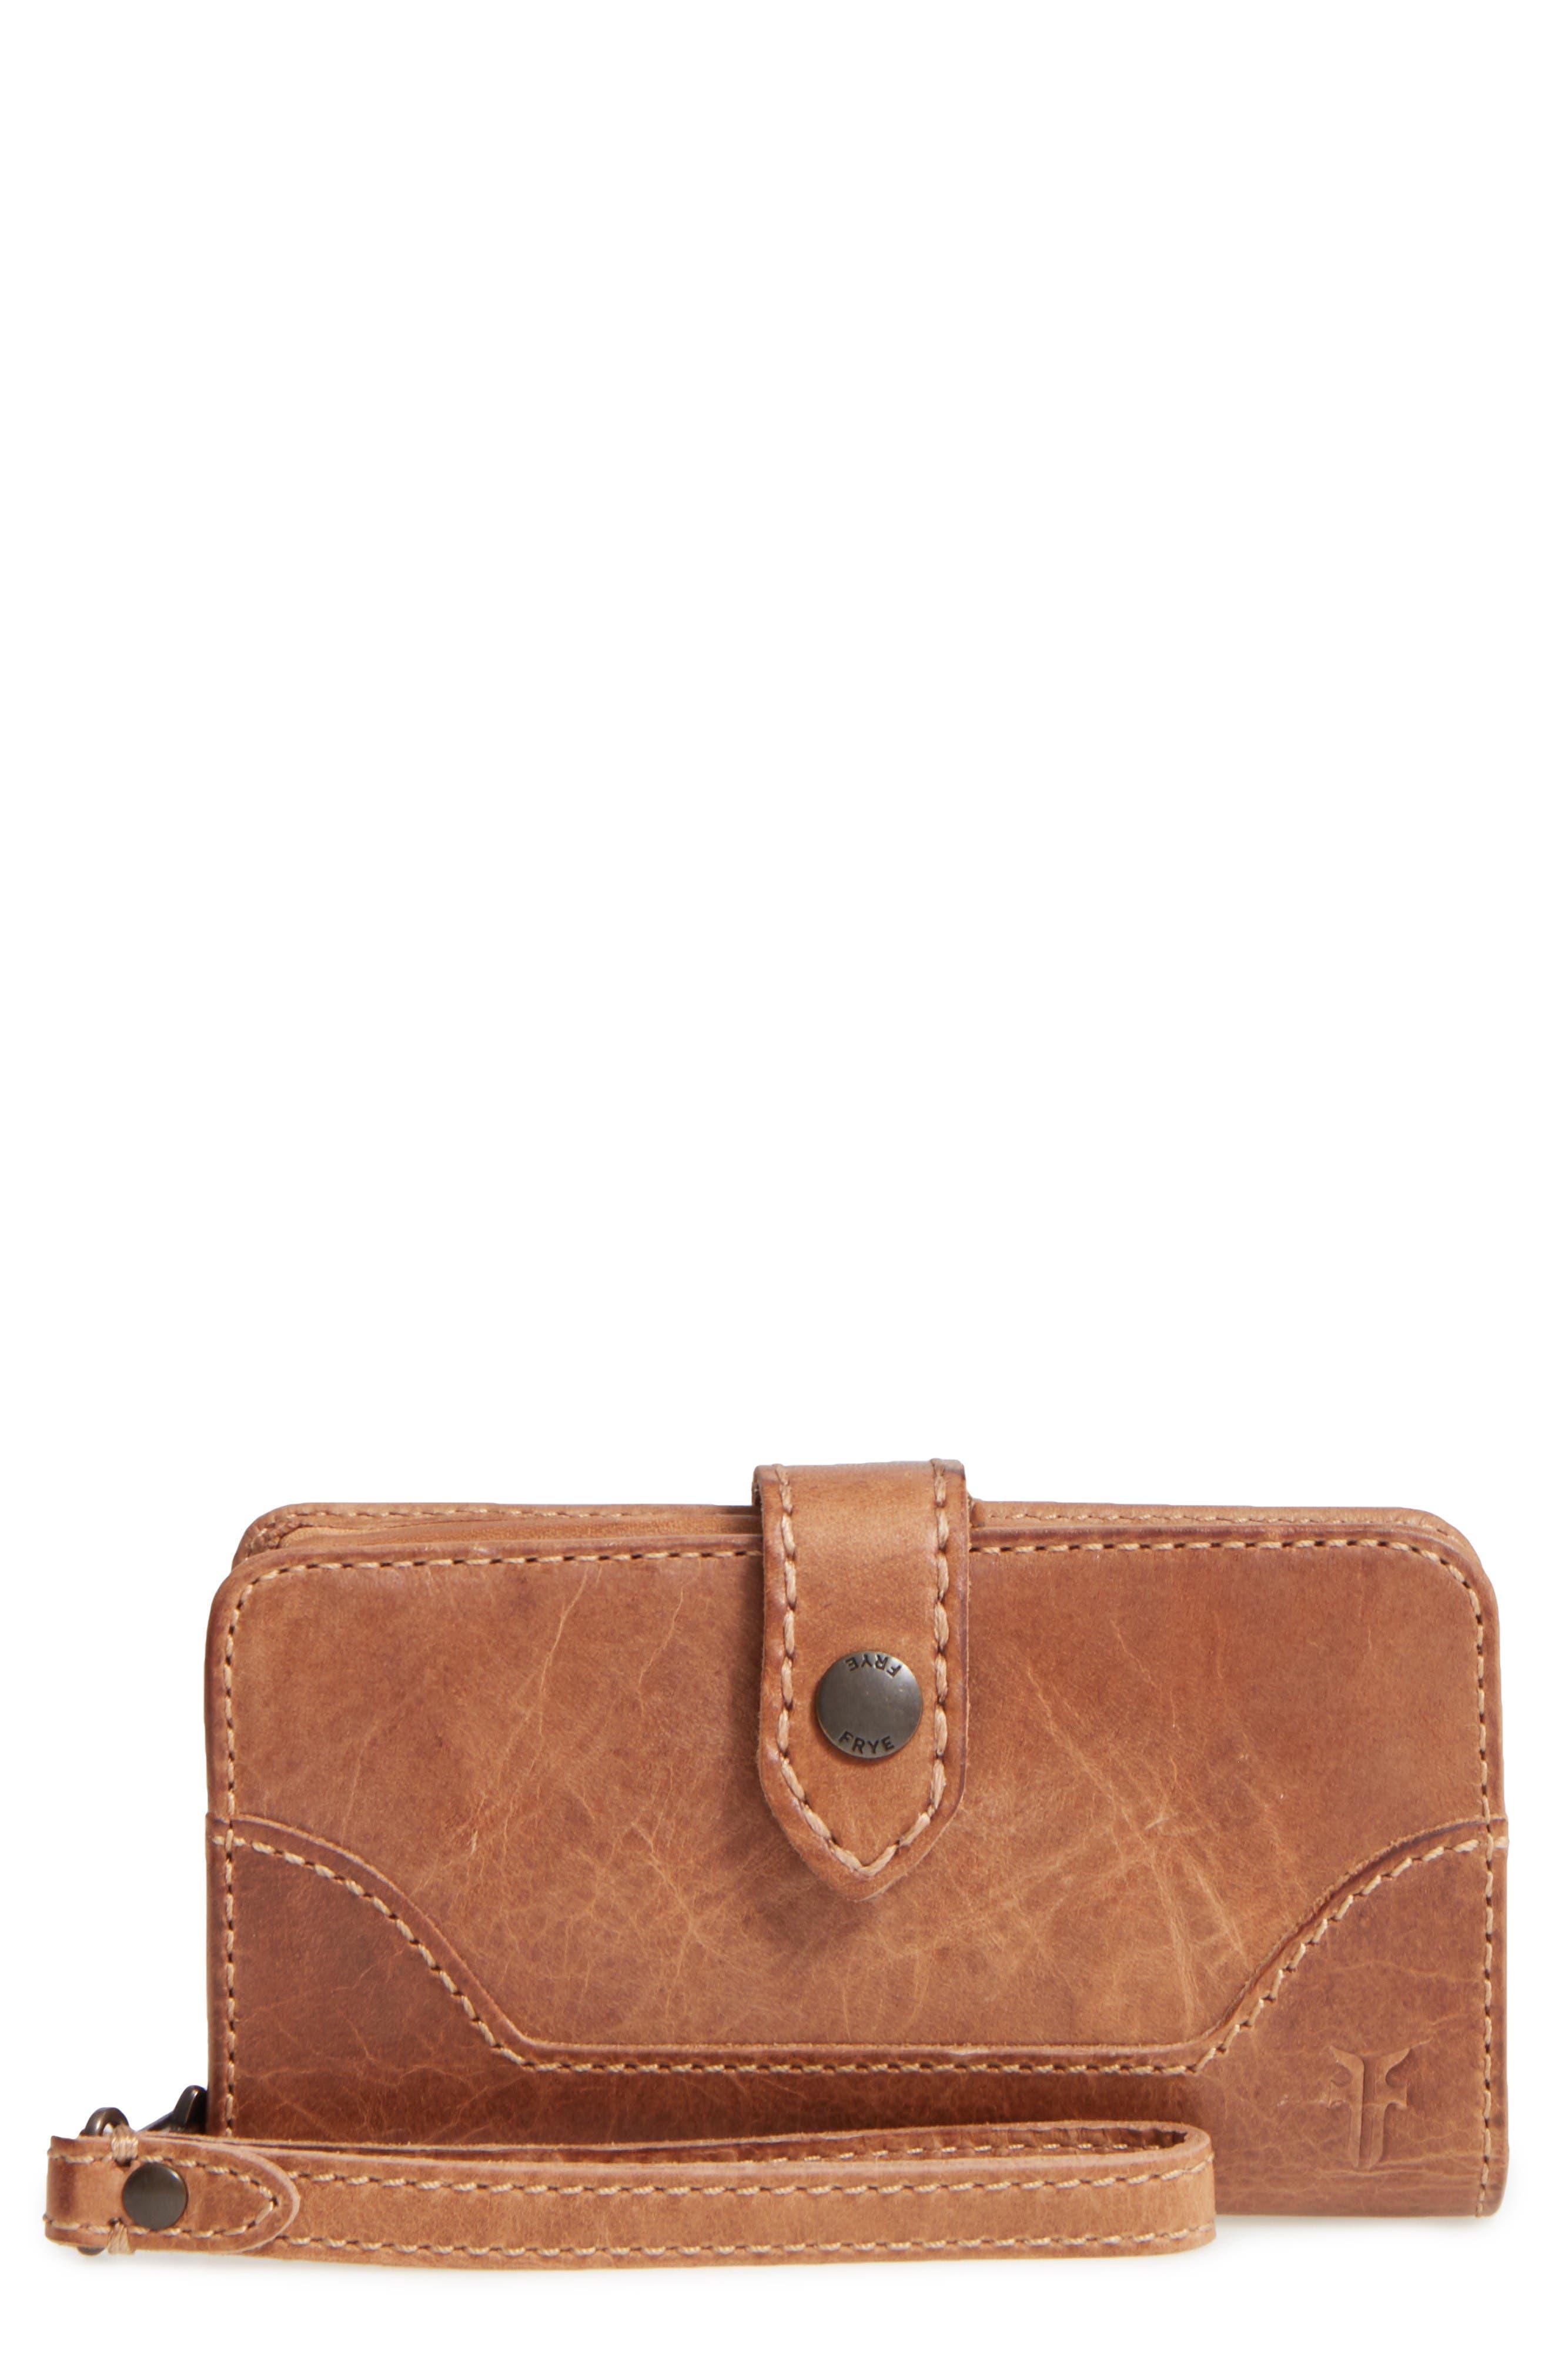 'Melissa' Leather Phone Wallet,                             Main thumbnail 1, color,                             Beige